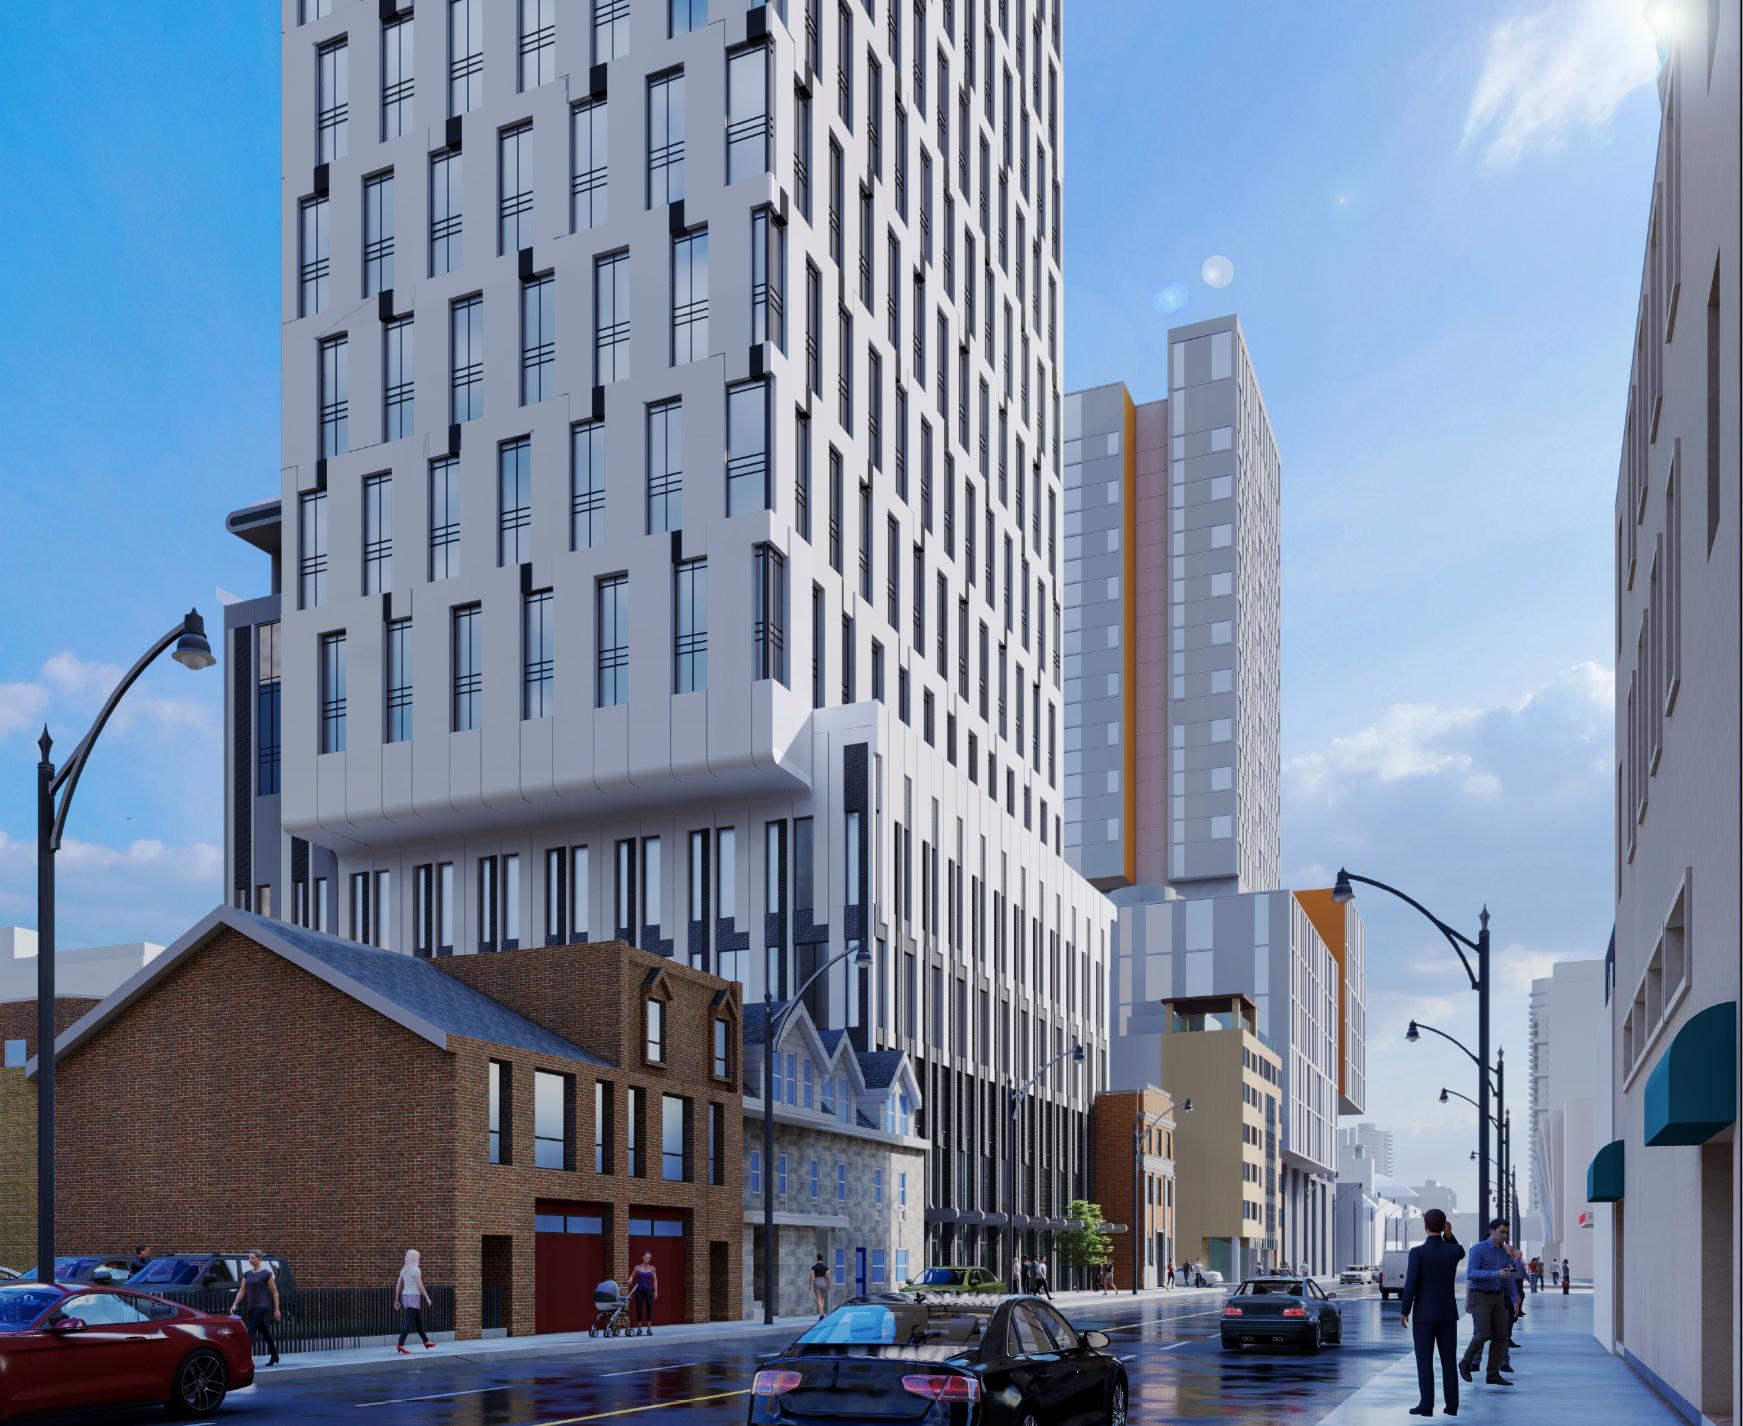 250 Church Street, Toronto, designed by IBI Group for CentreCourt